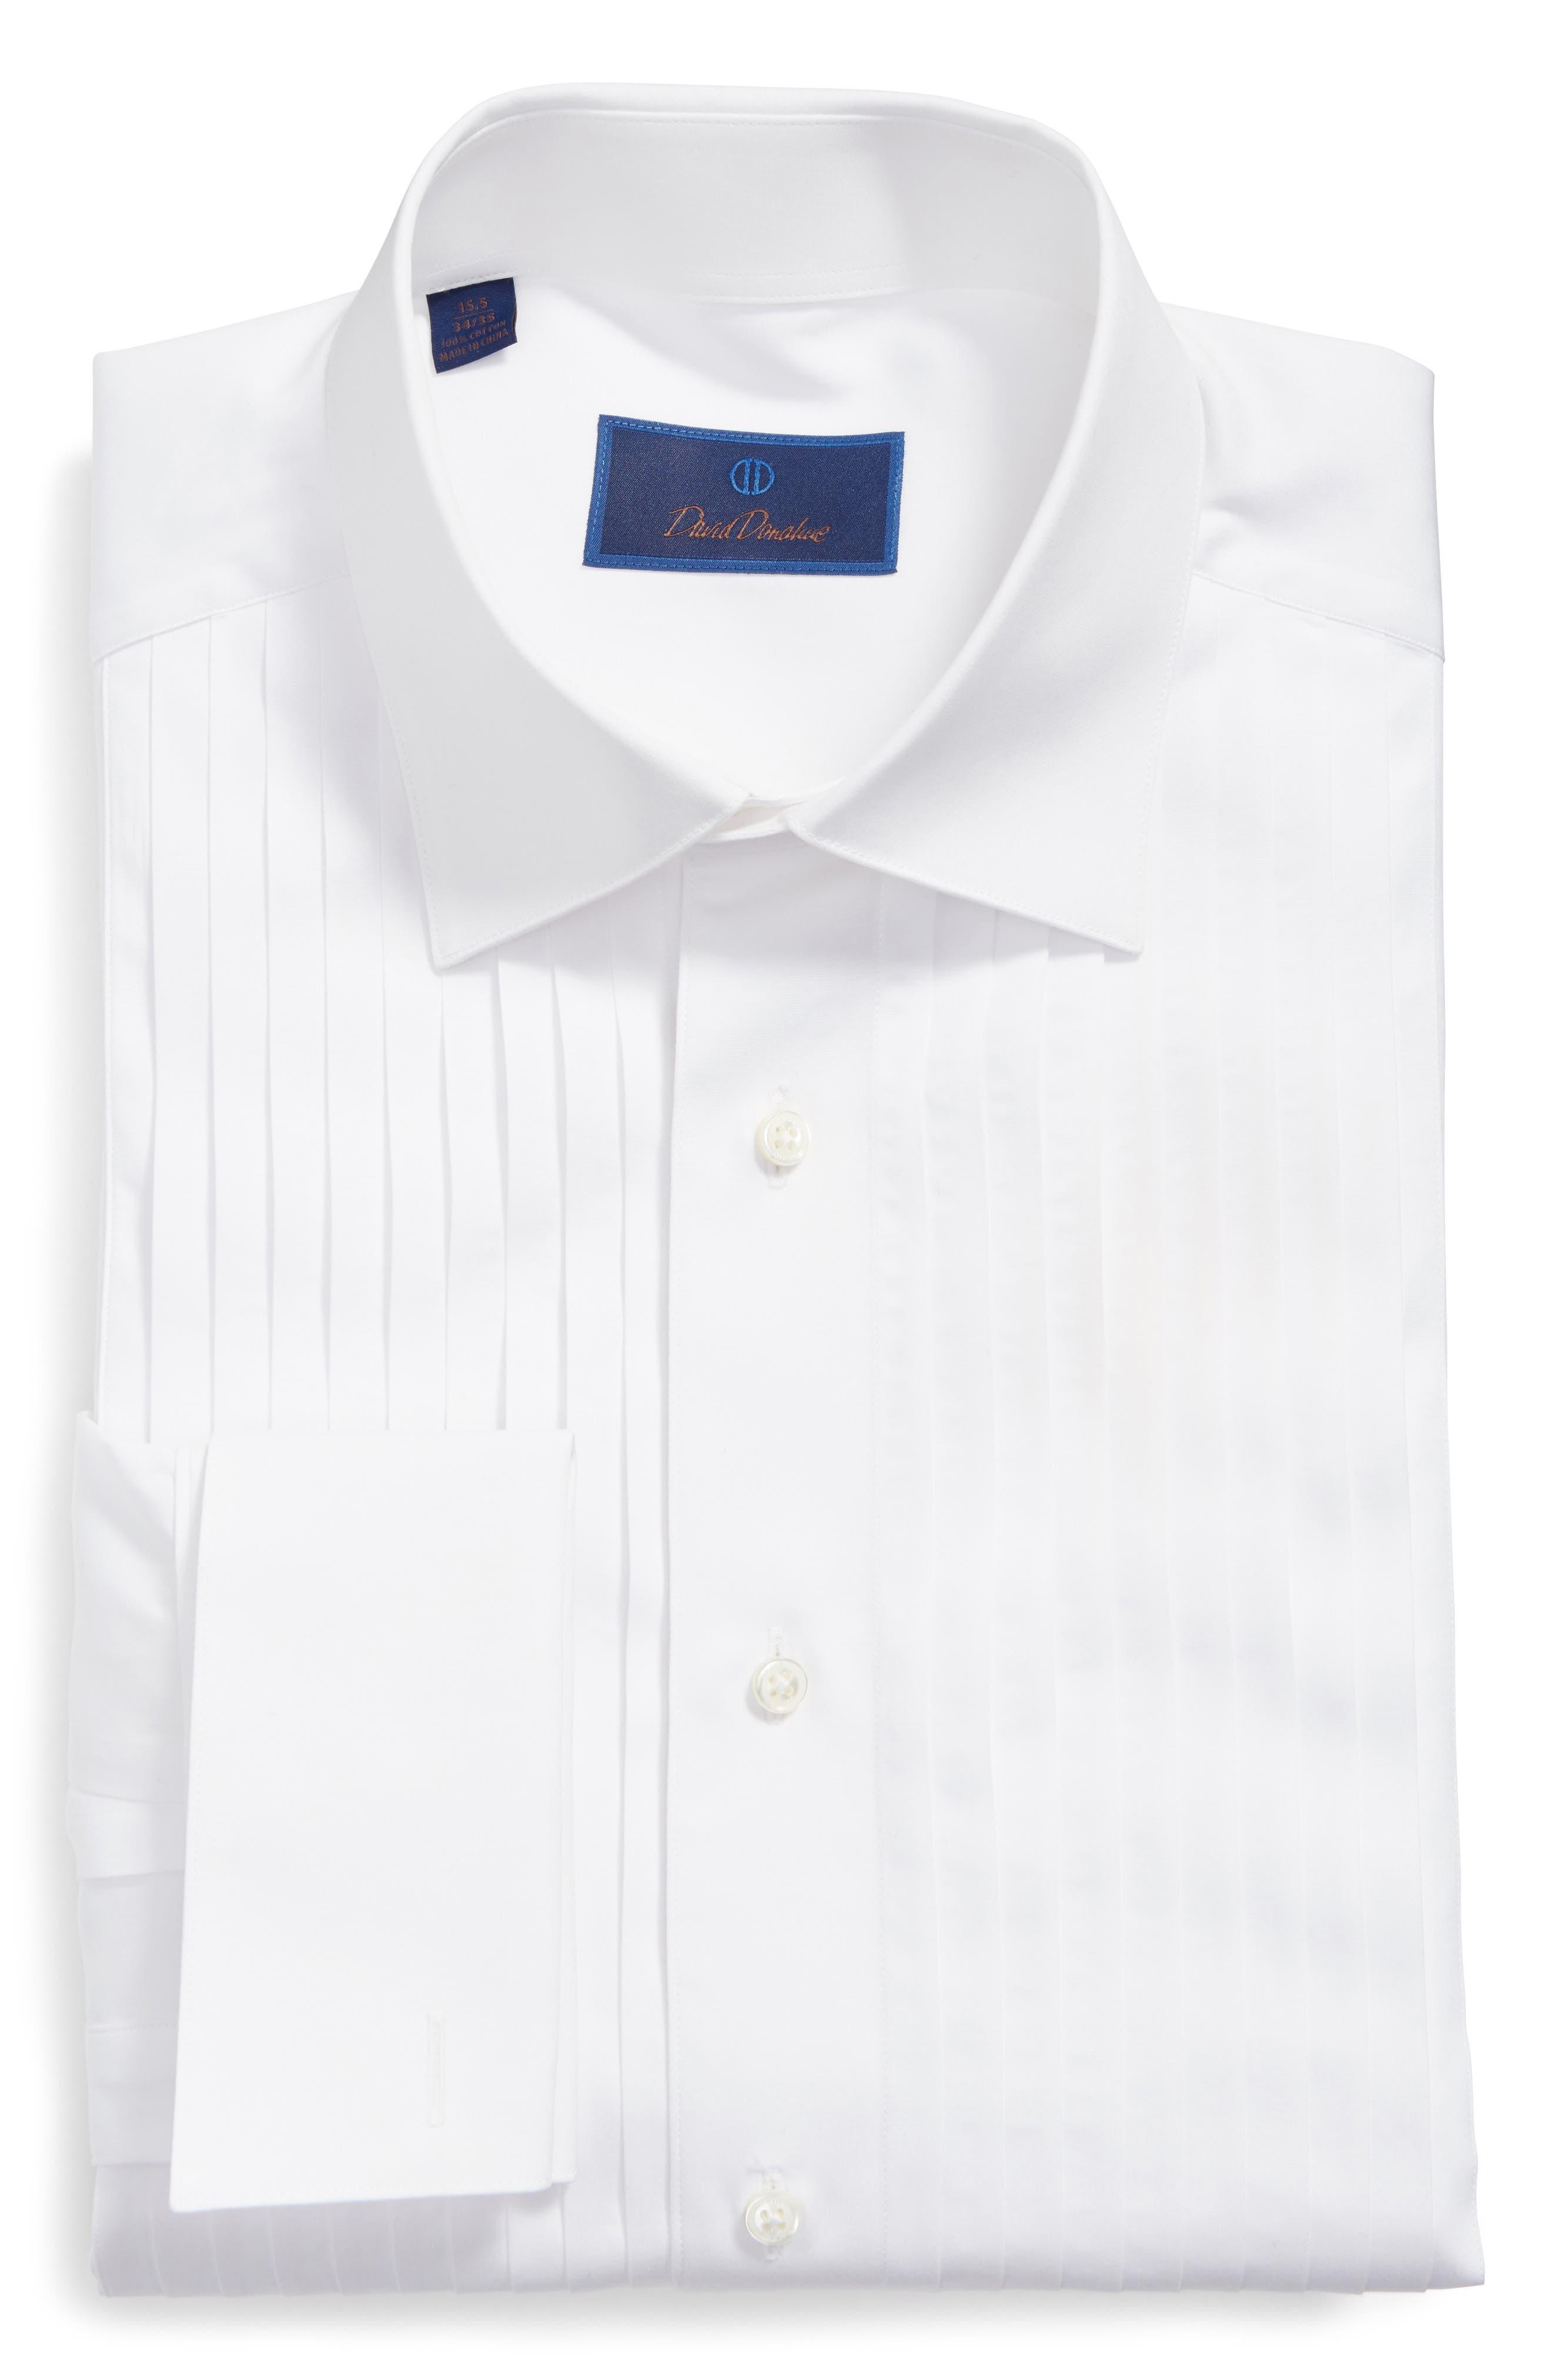 DAVID DONAHUE Regular Fit French Cuff Tuxedo Shirt, Main, color, WHITE